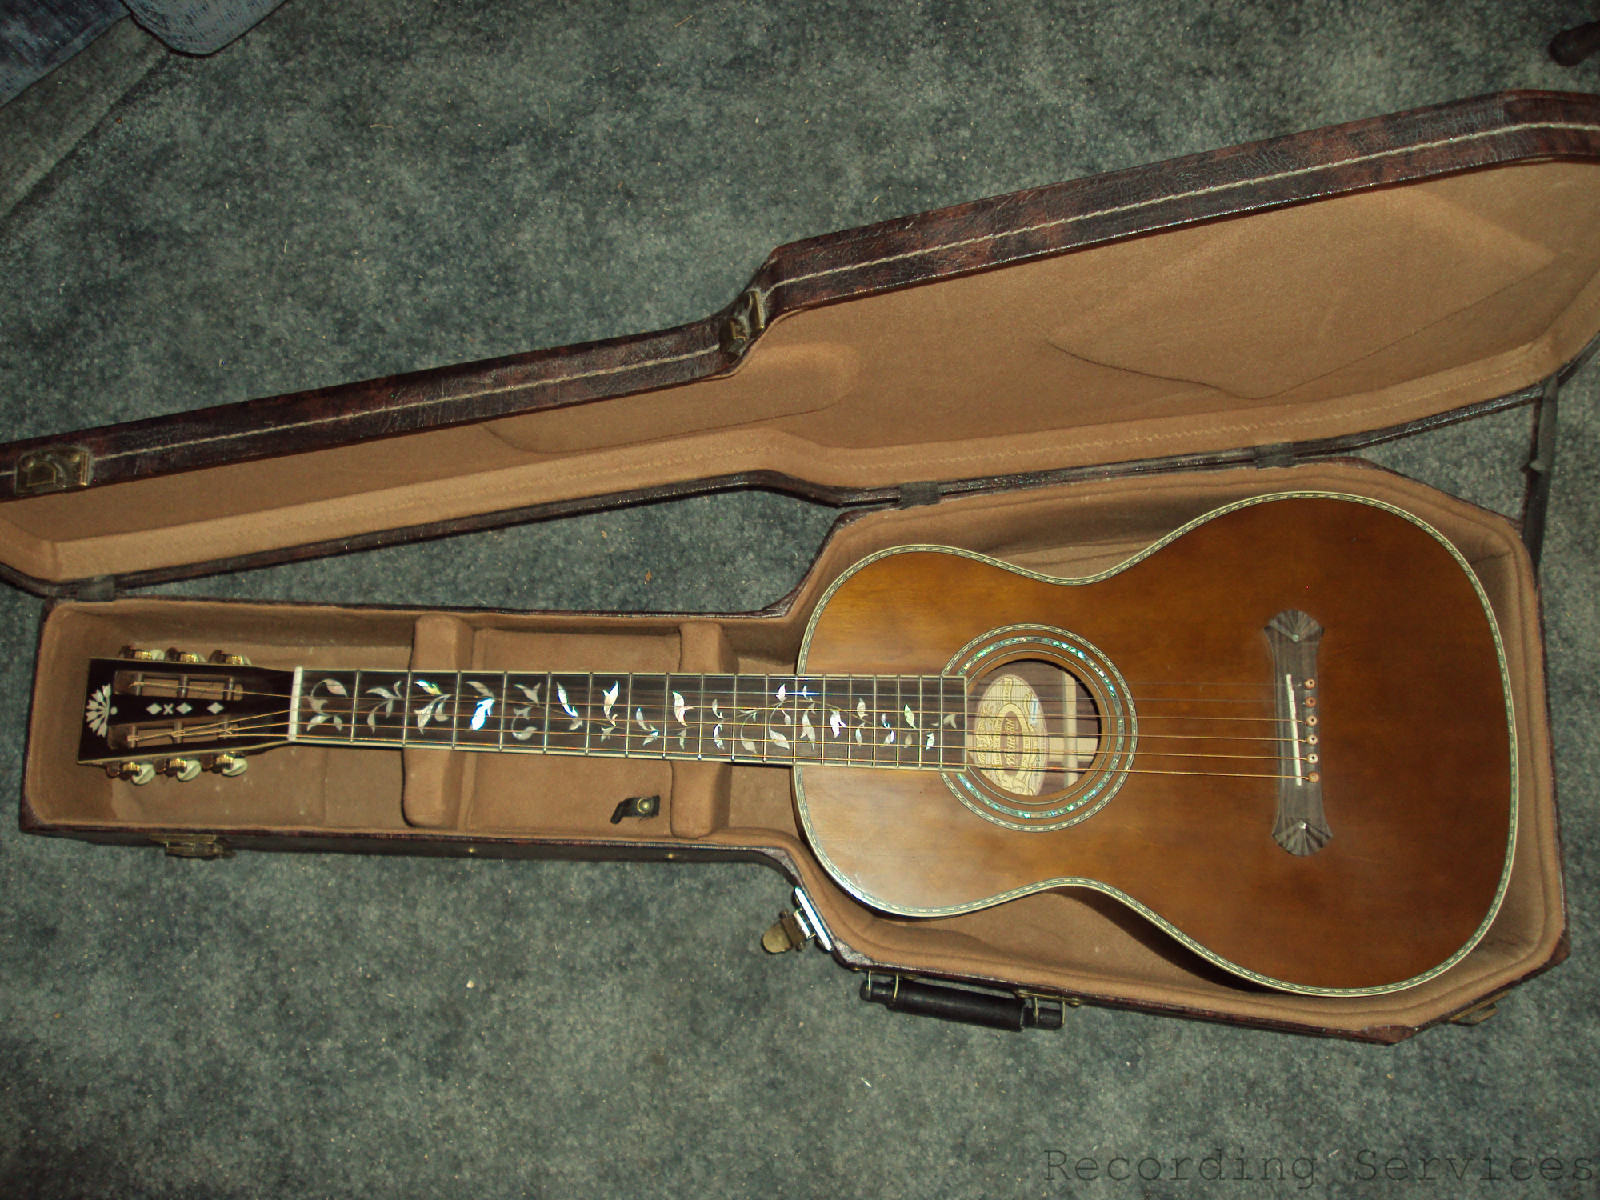 Washburn Vintage Series R320swrk Acoustic Guitar Factory